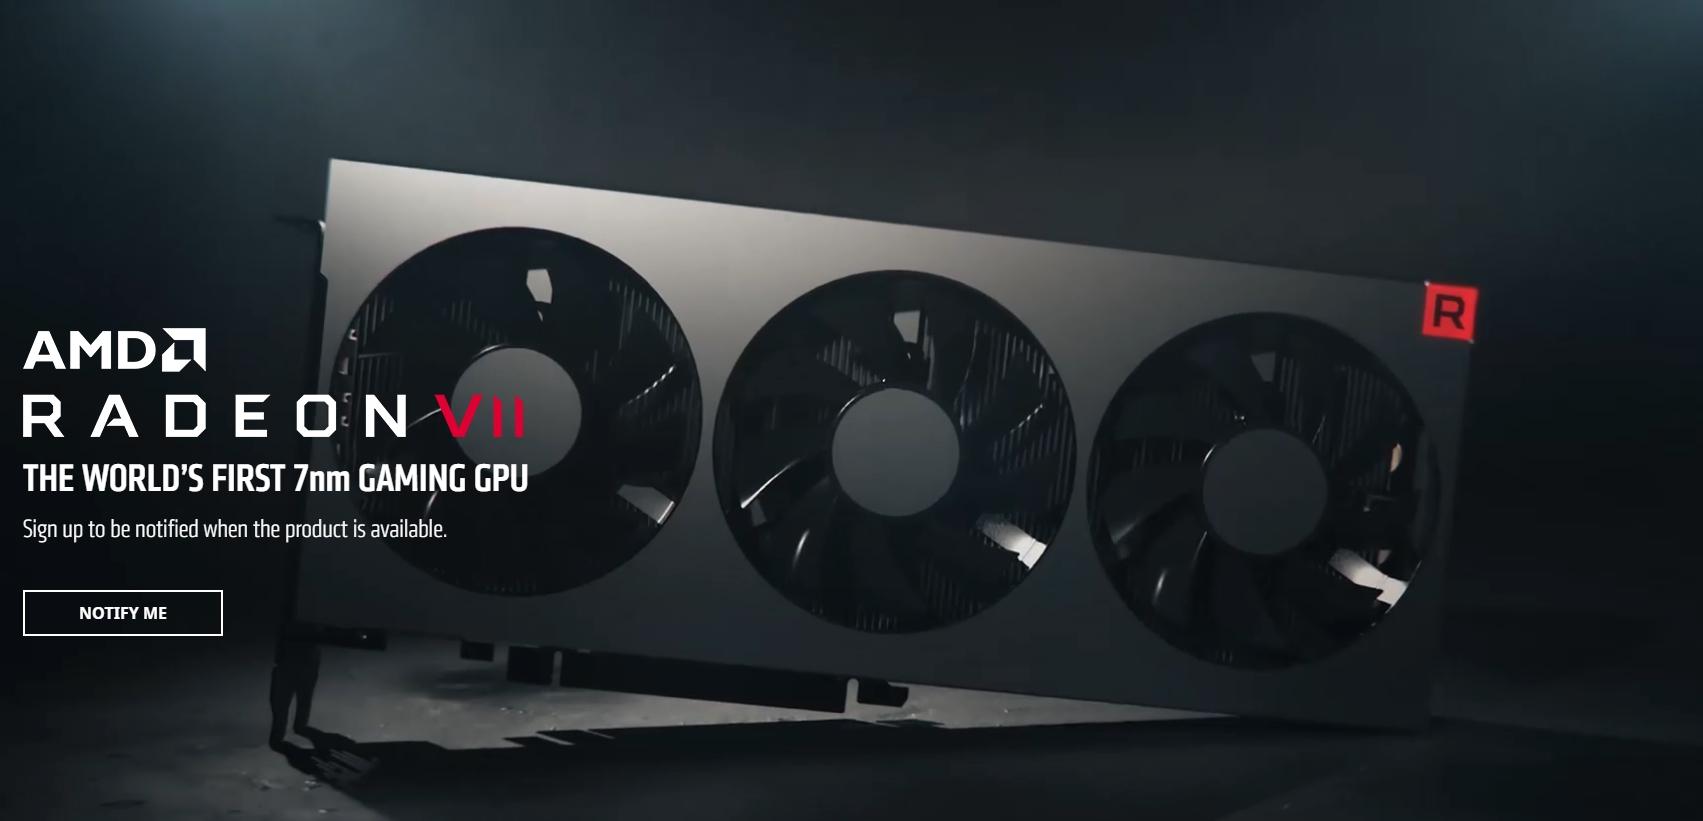 Представлена видеокарта AMD Radeon VII: семинанометровый GPU